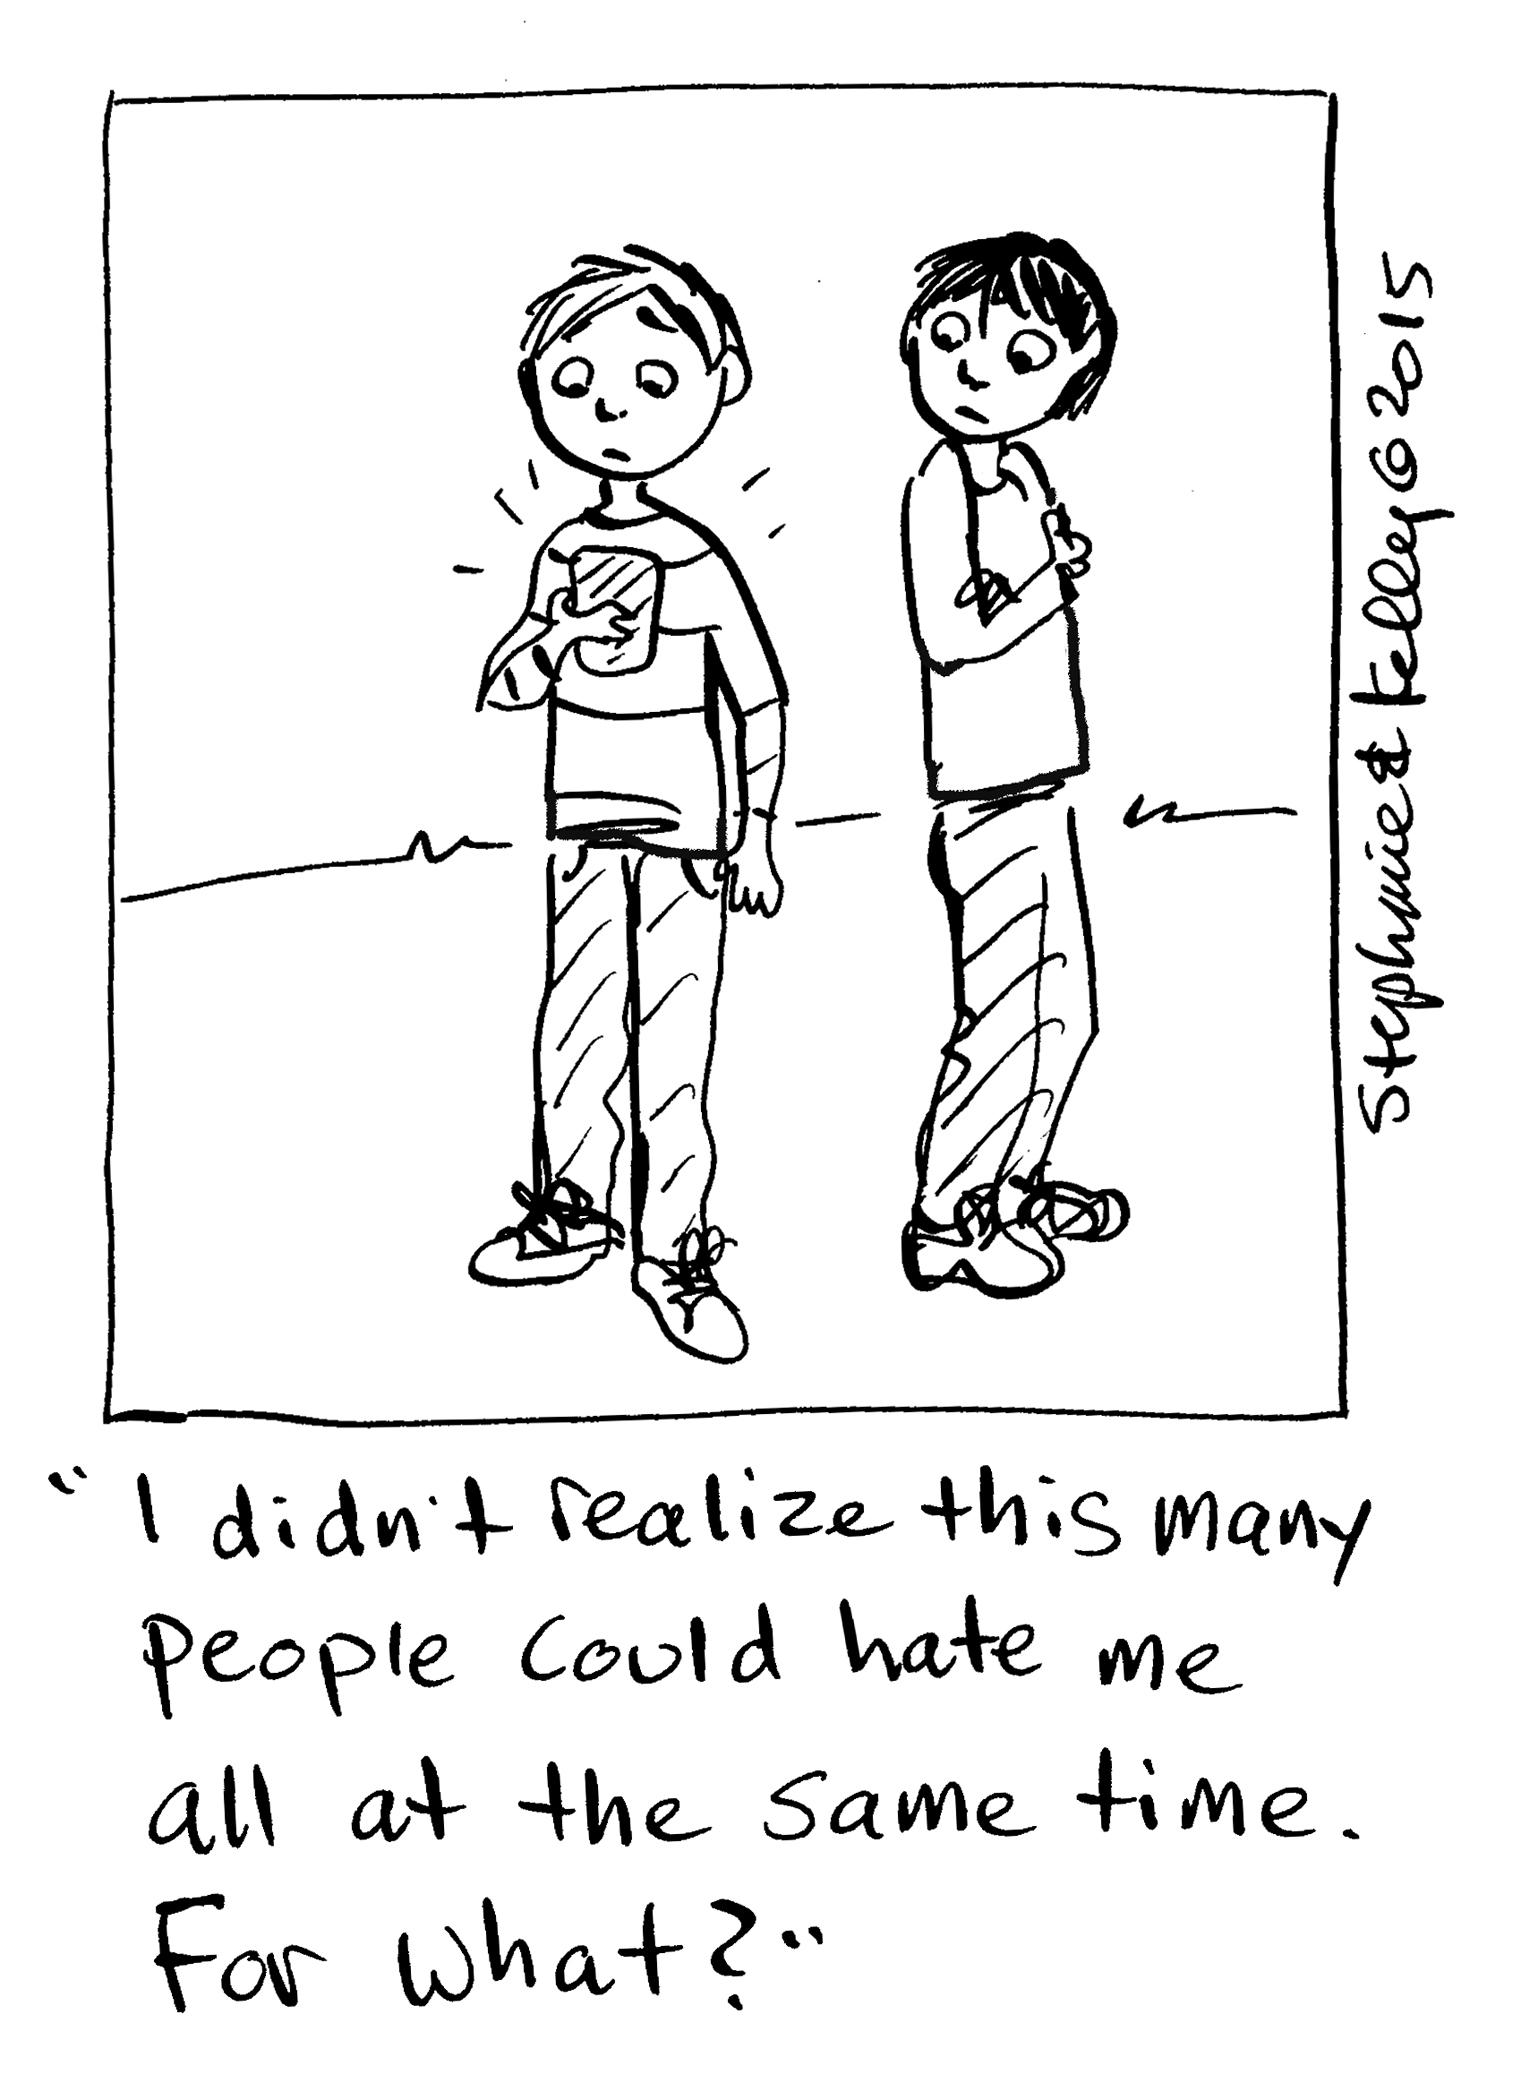 Honest Cartoons On Tough Subjects